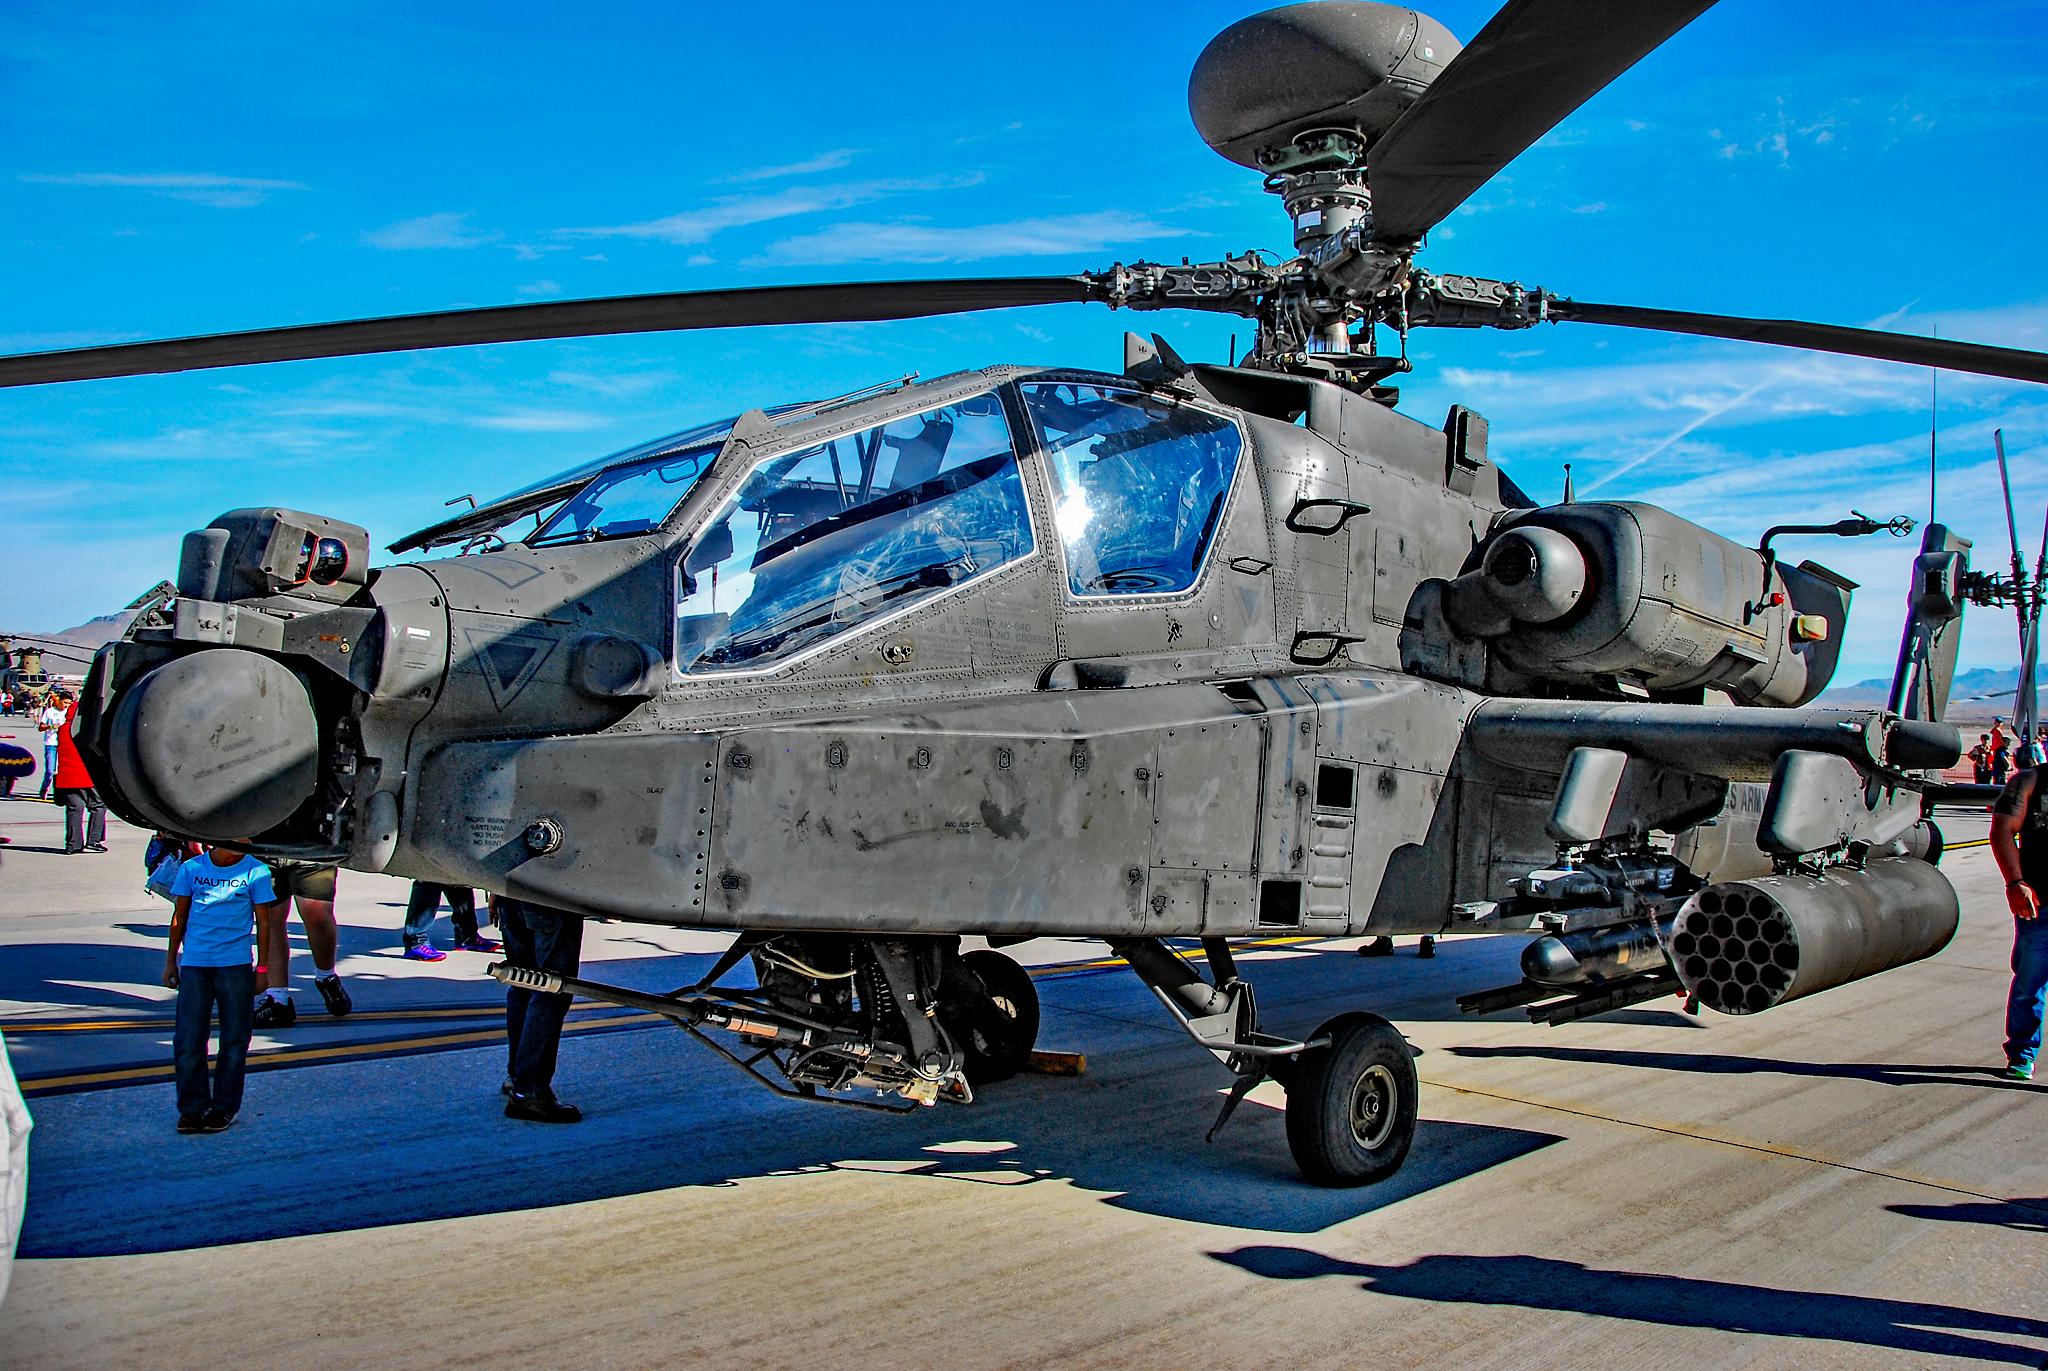 File:Boeing AH-64E Apache (30874933072).jpg - Wikimedia Commons